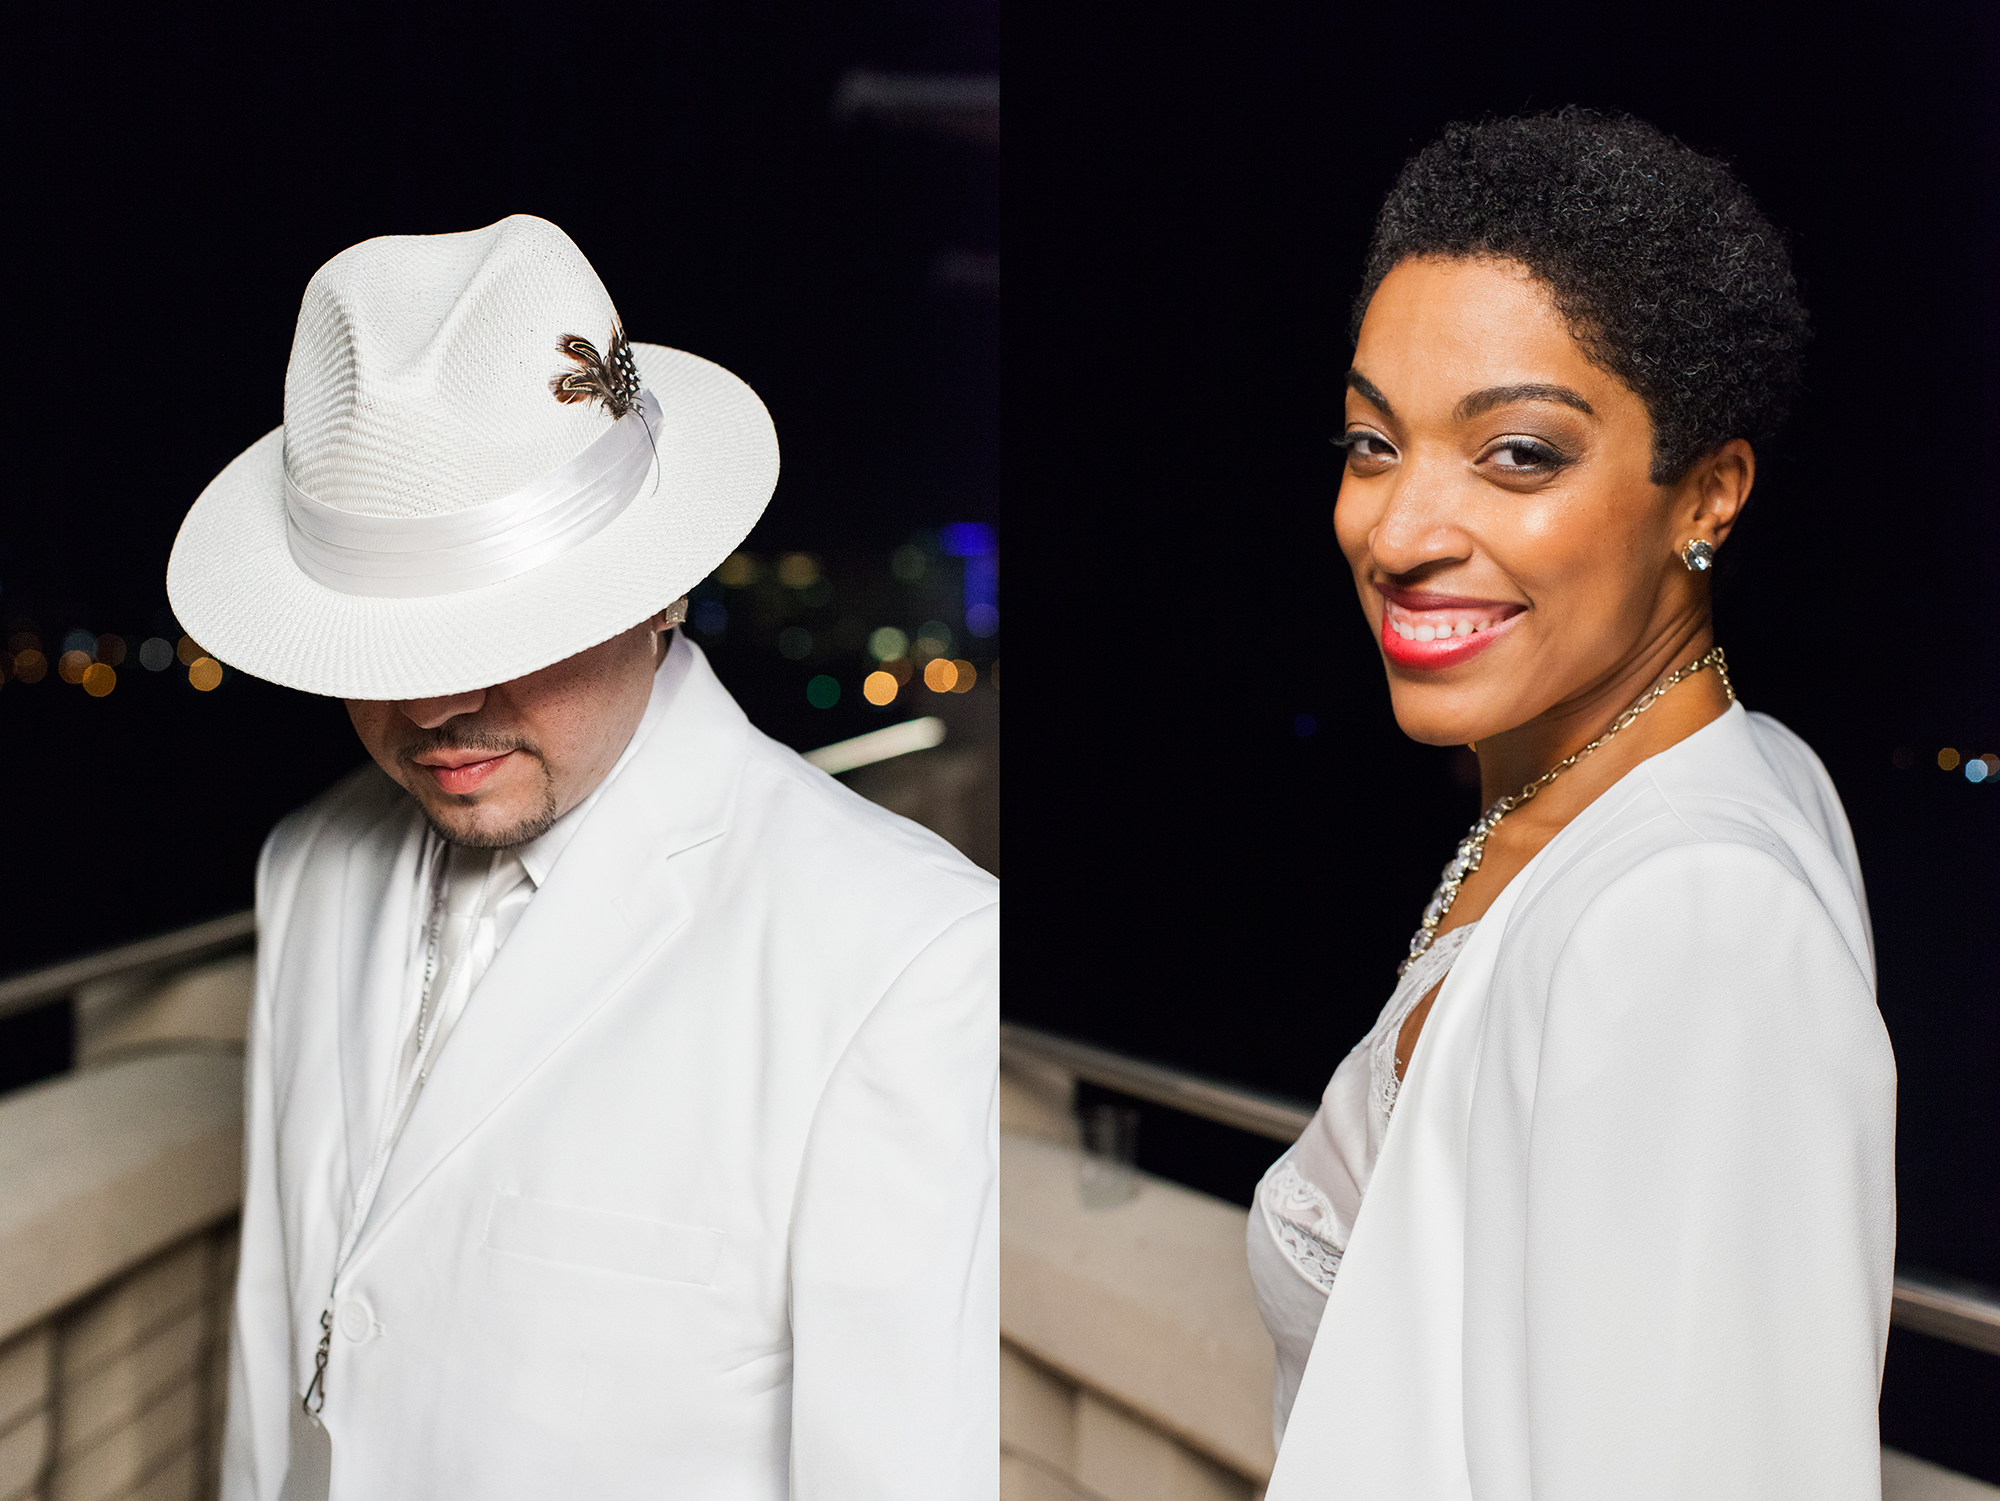 Men and Woman's Fashion at DEB Dallas 2015